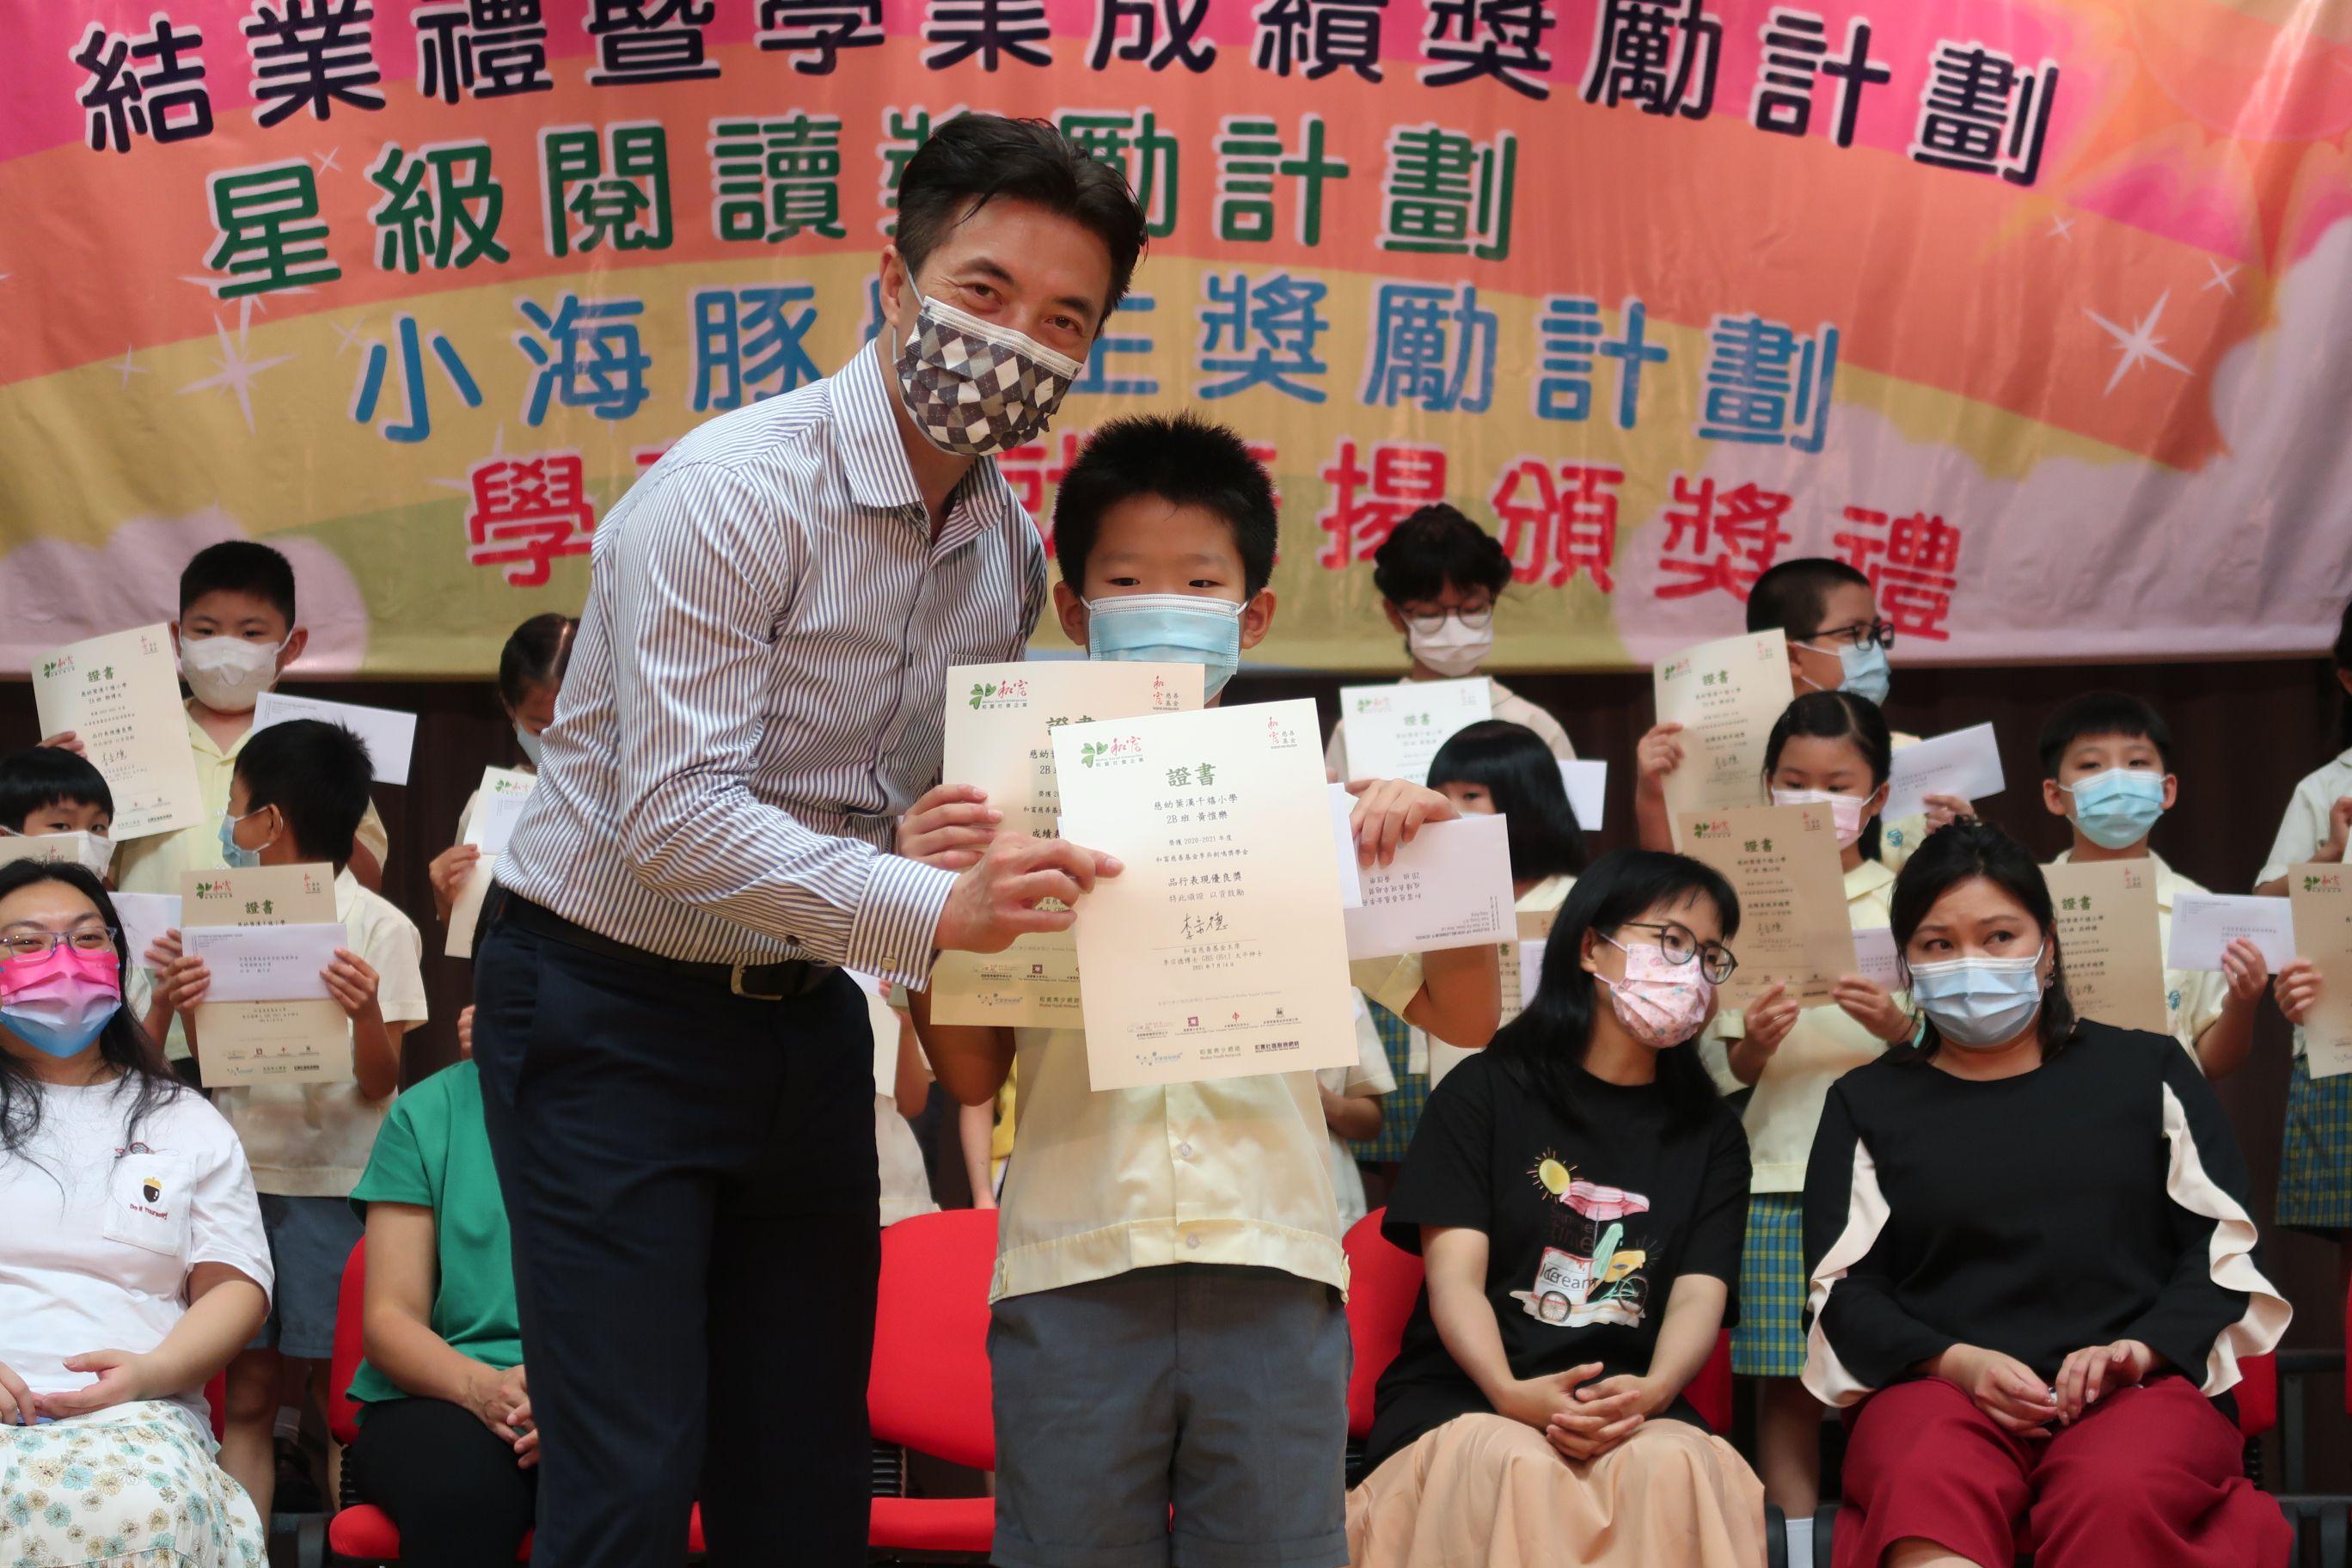 https://syh.edu.hk/sites/default/files/img_5956_1.jpg